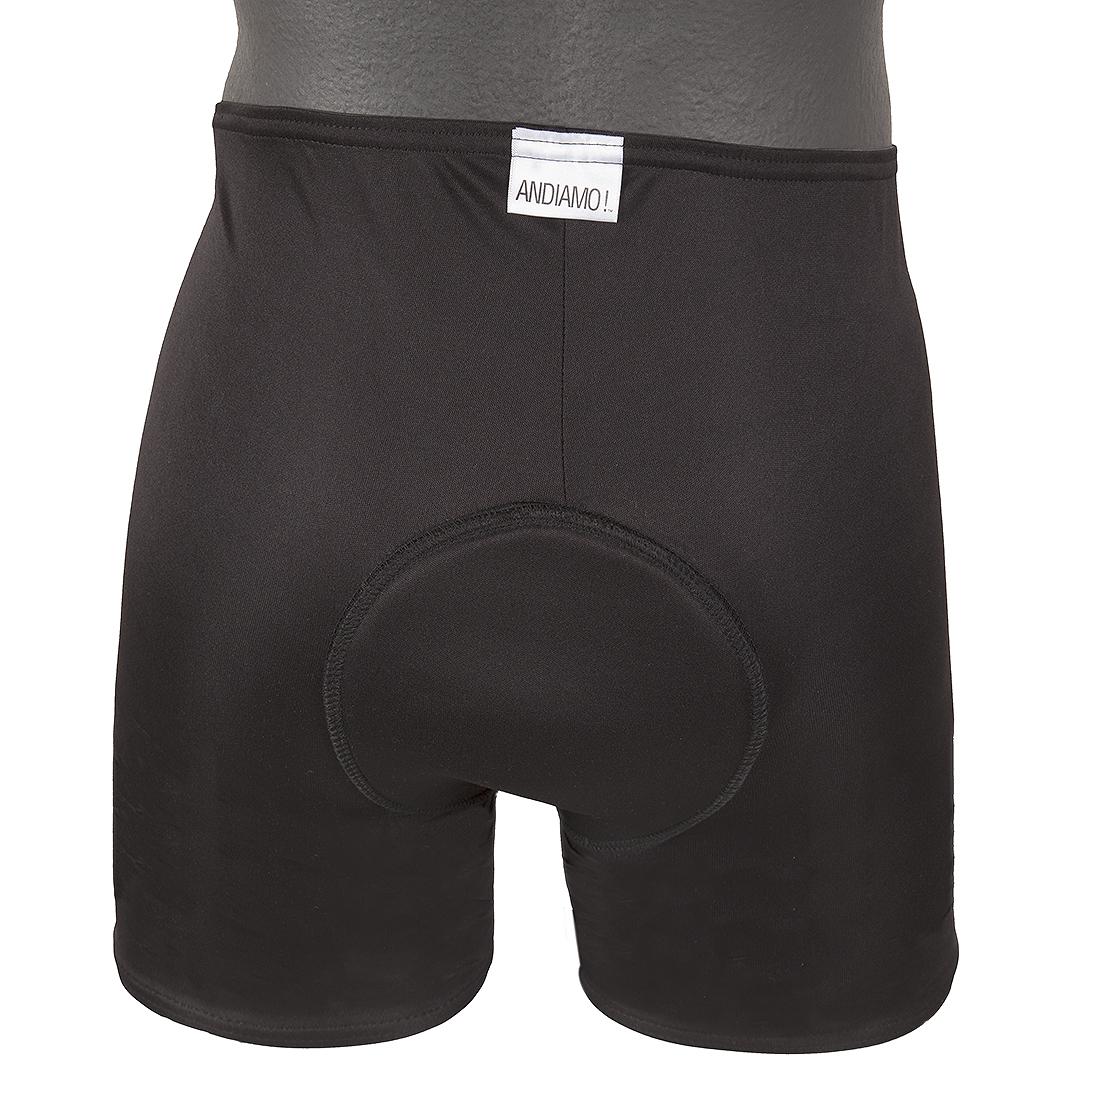 Andiamo Women`s Padded Brief Clothing Shorts Admo Pad Brief Wom Bk Lg